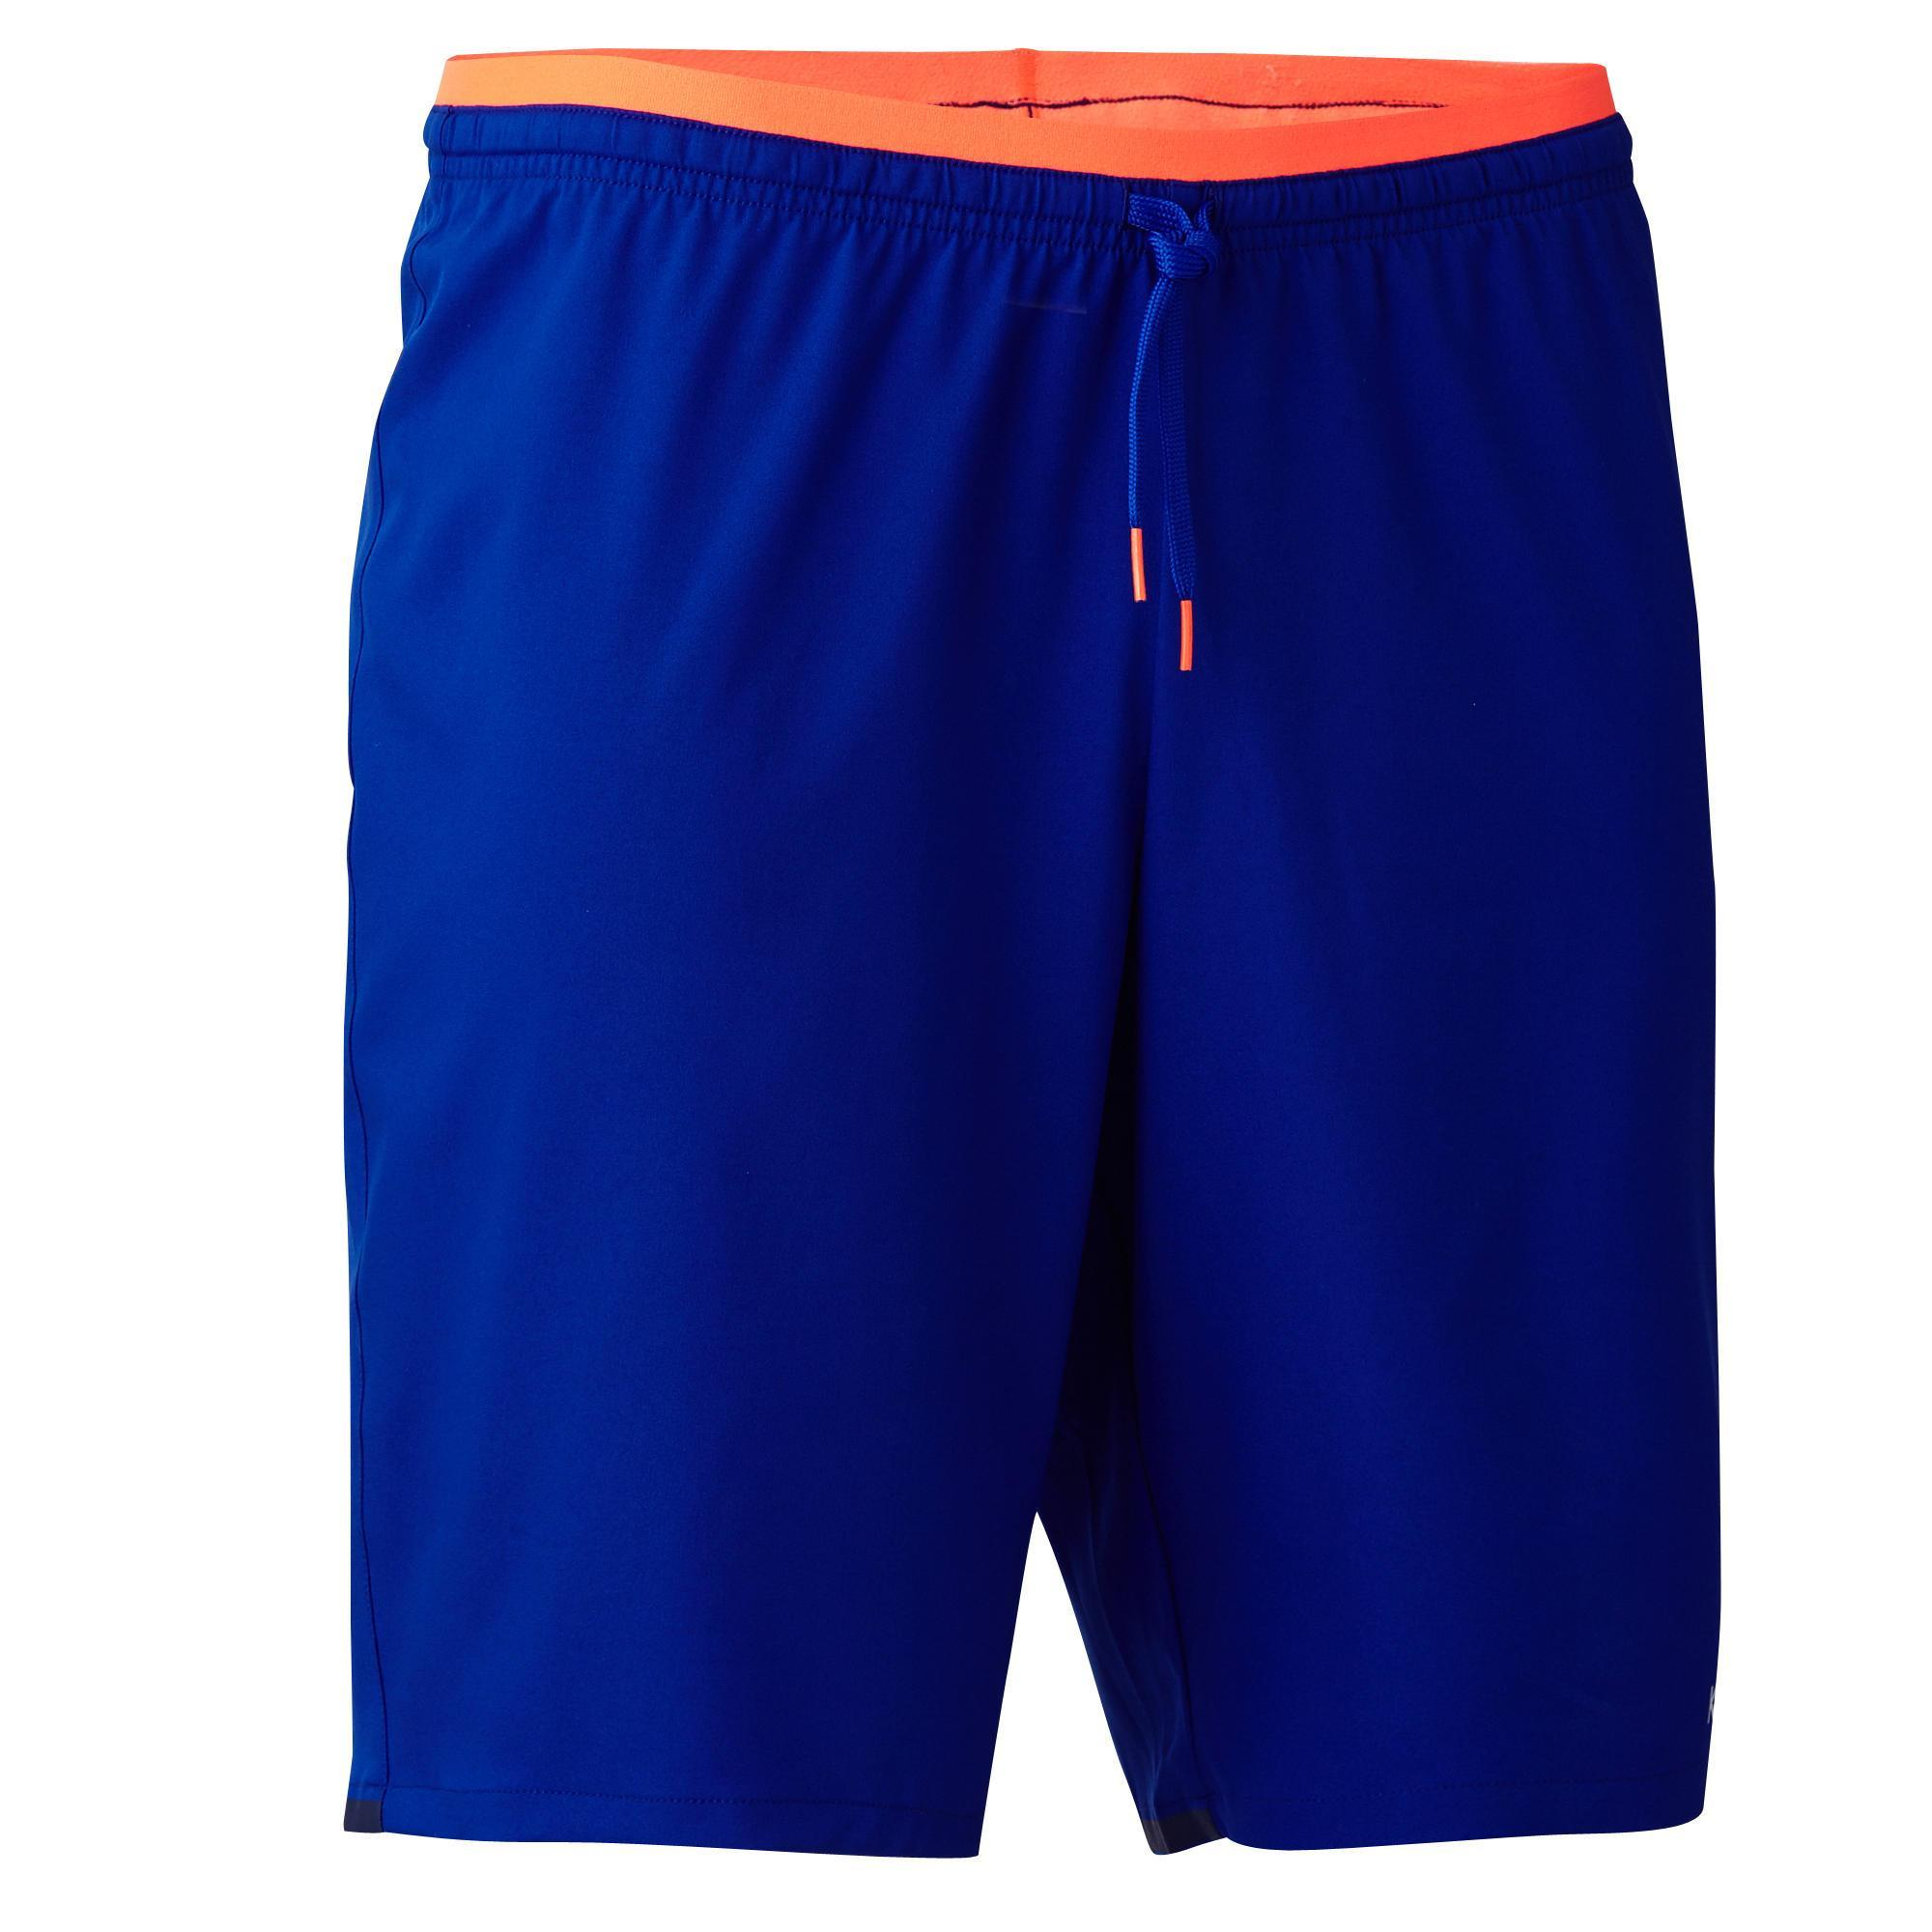 Fußballshorts F500 Erwachsene blau | Sportbekleidung > Sporthosen > Fußballhosen | Blau - Rot - Orange | Trikot | Kipsta